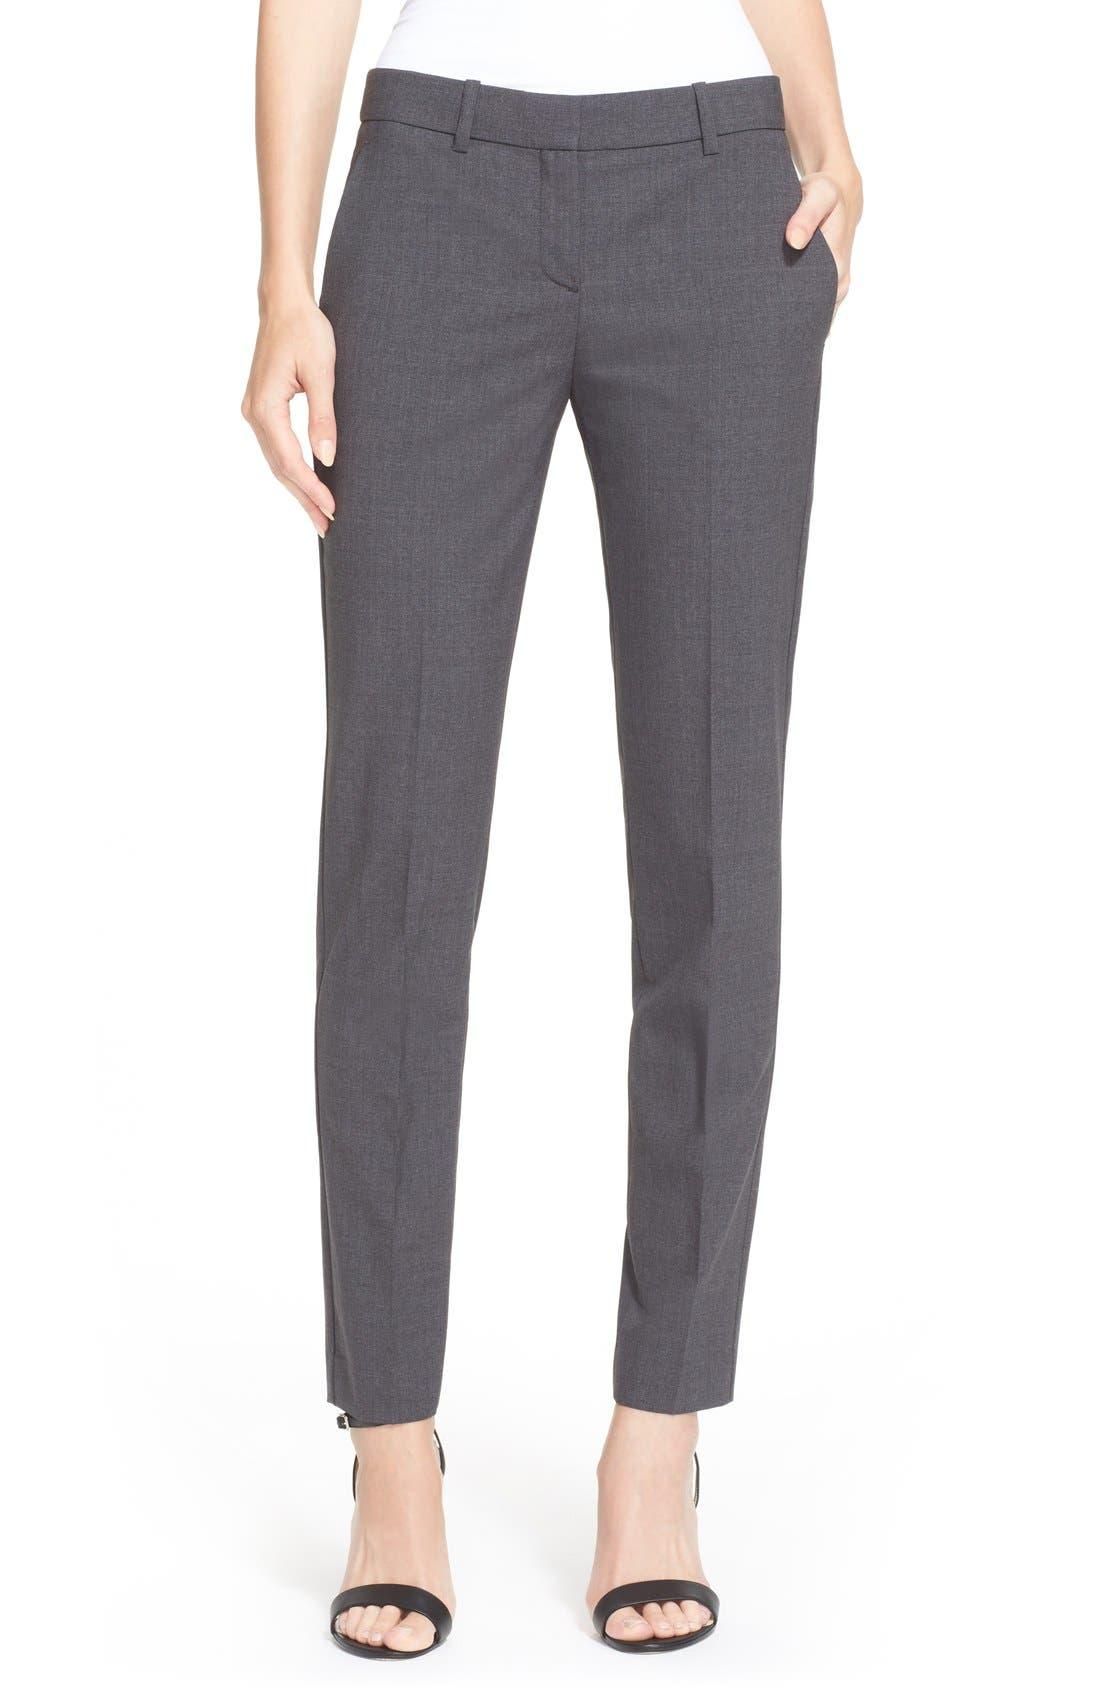 Testra 2B Stretch Wool Pants,                         Main,                         color, 020